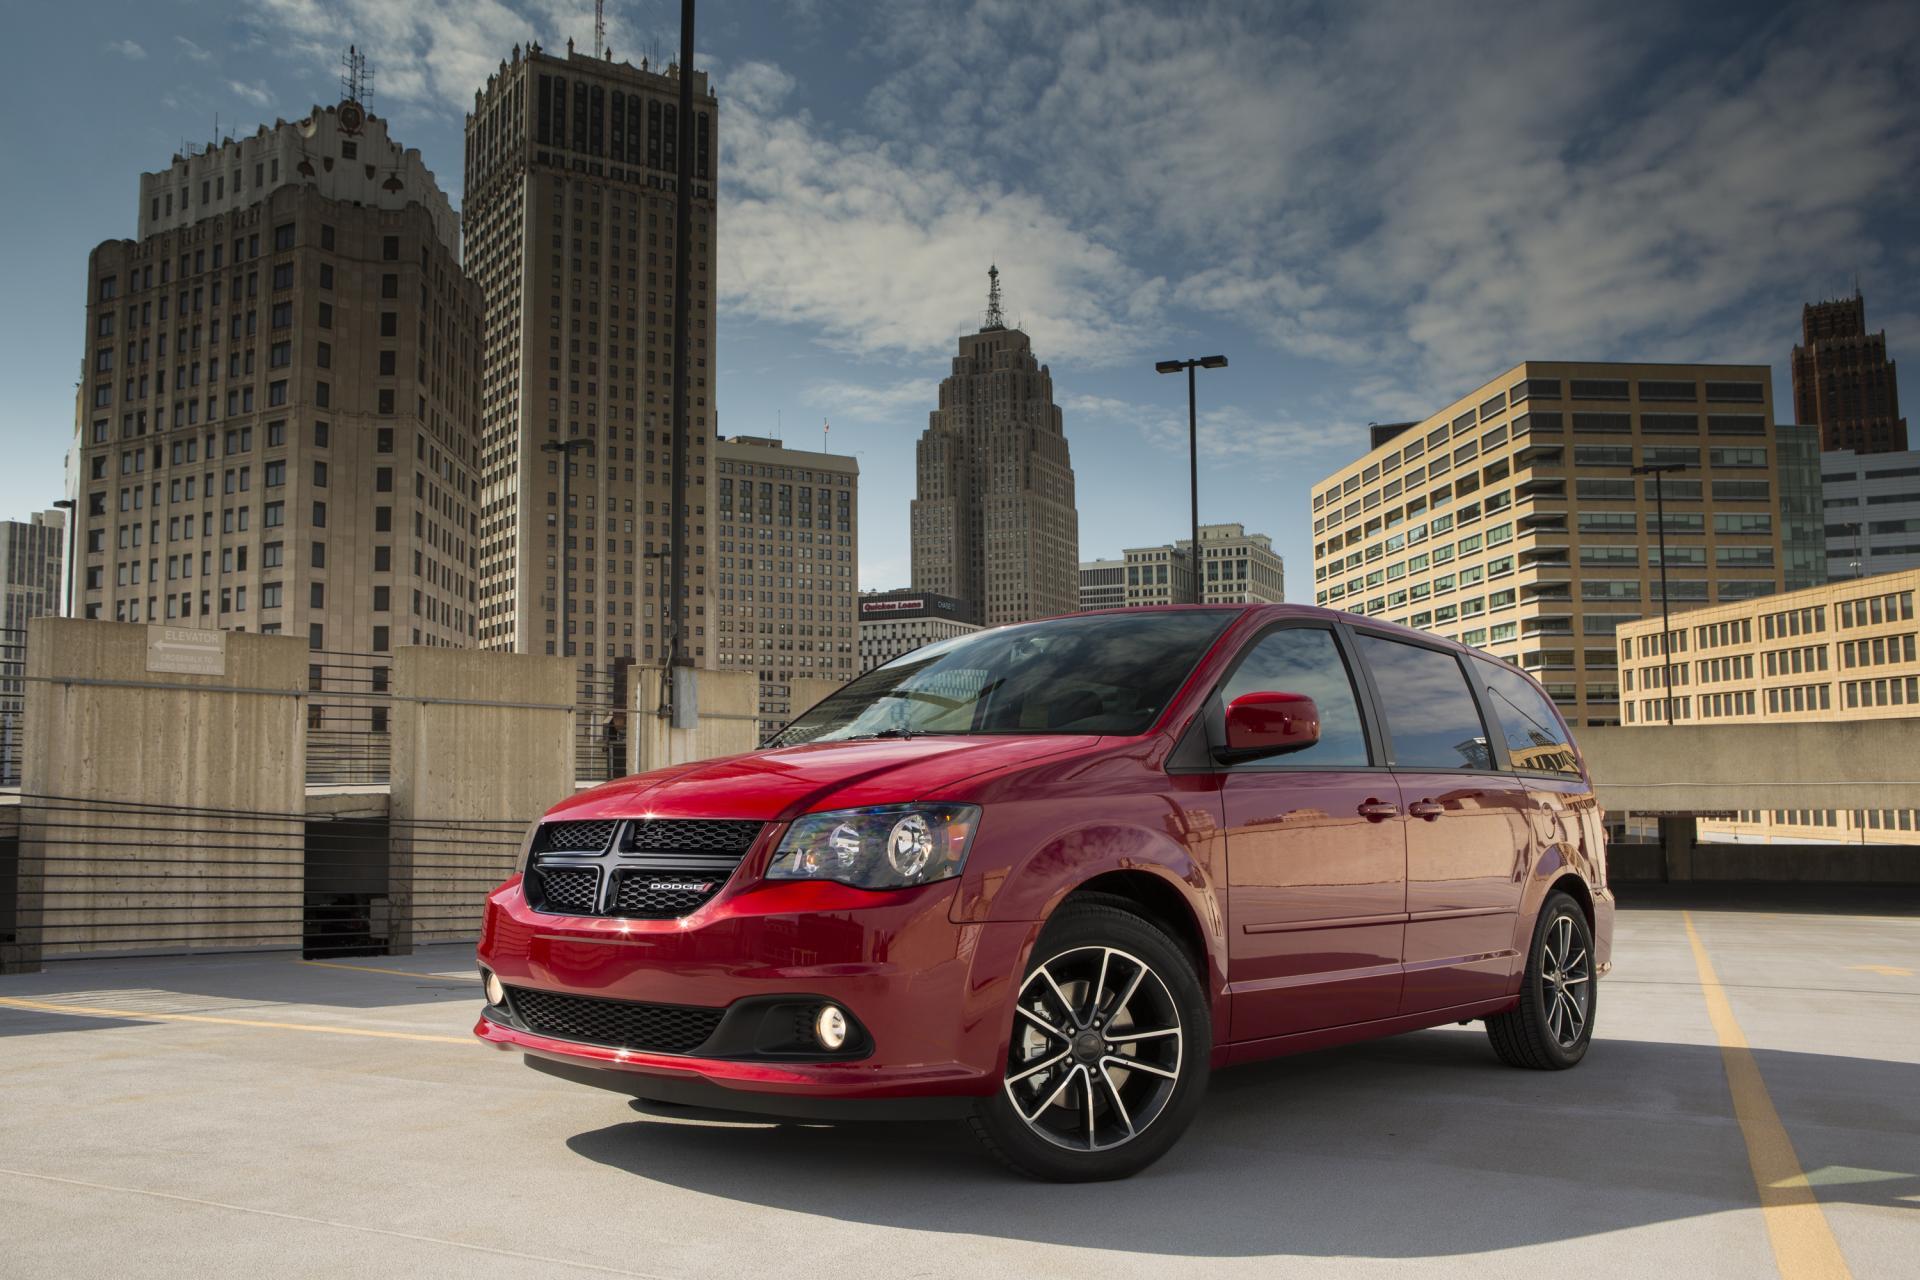 2013 Dodge Grand Caravan Blacktop Edition News And Information